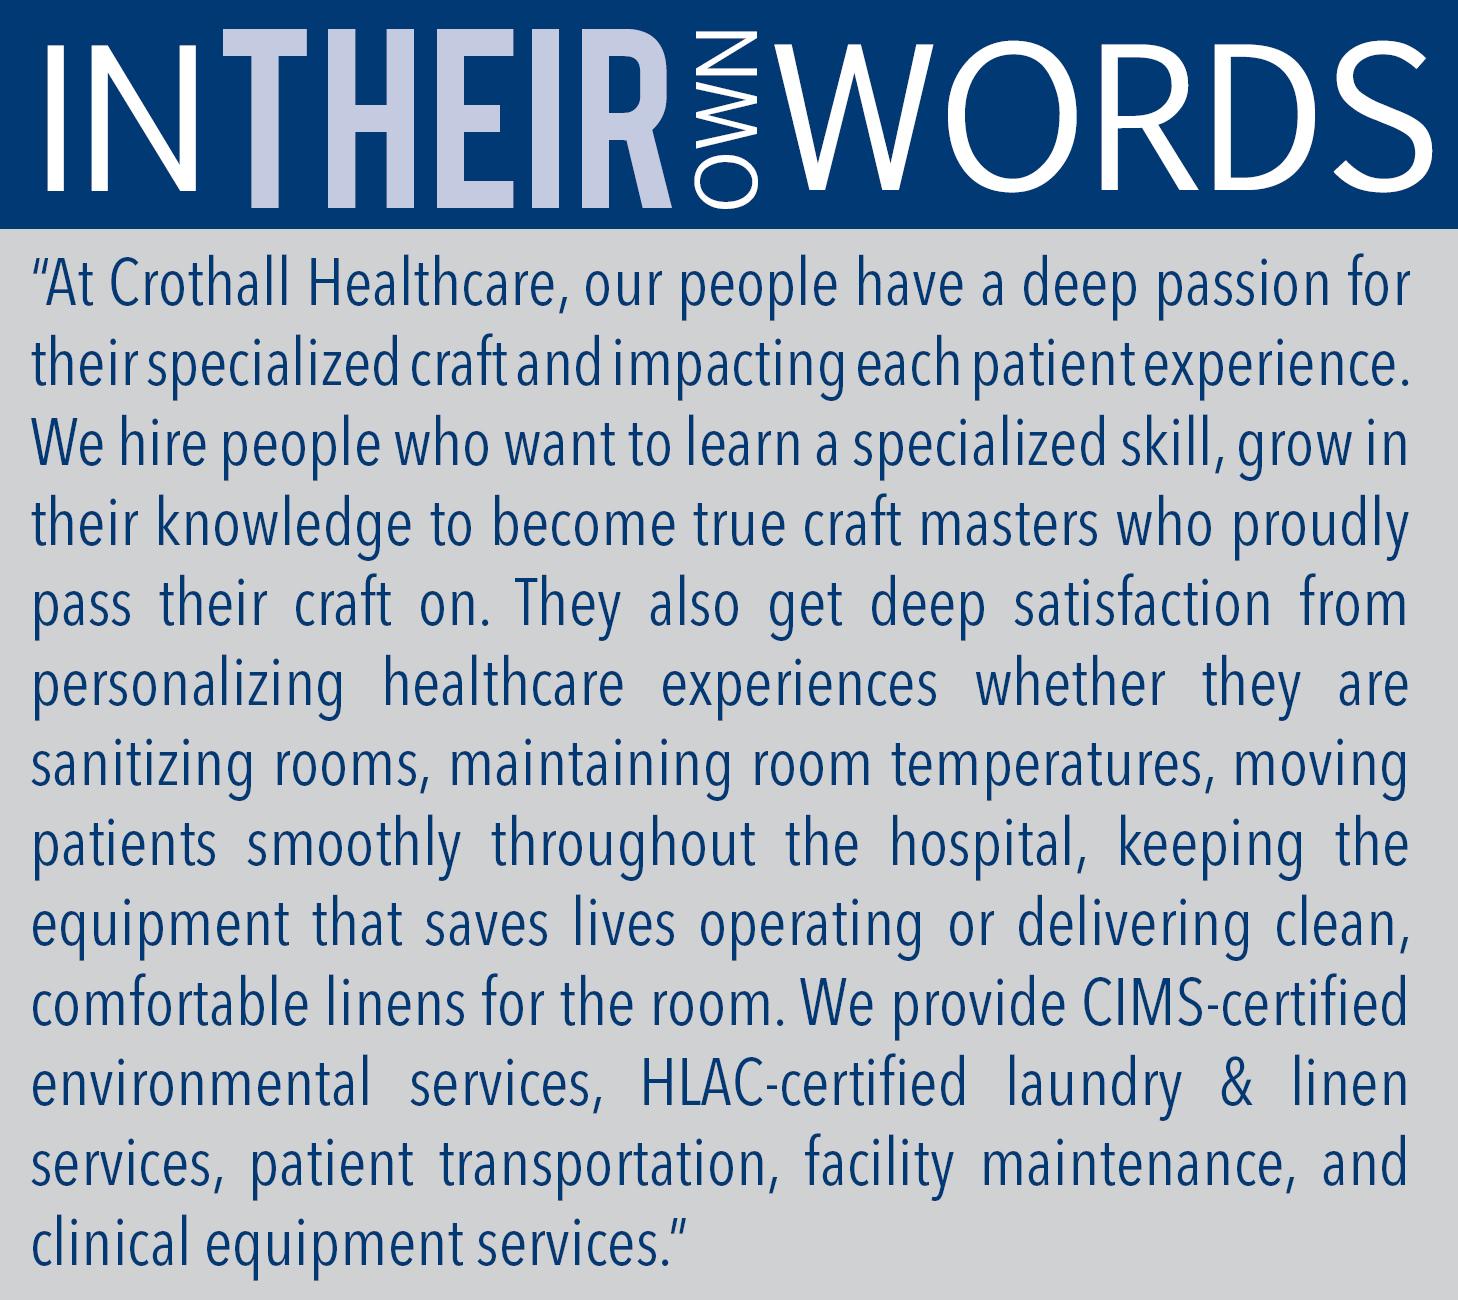 crothall-words